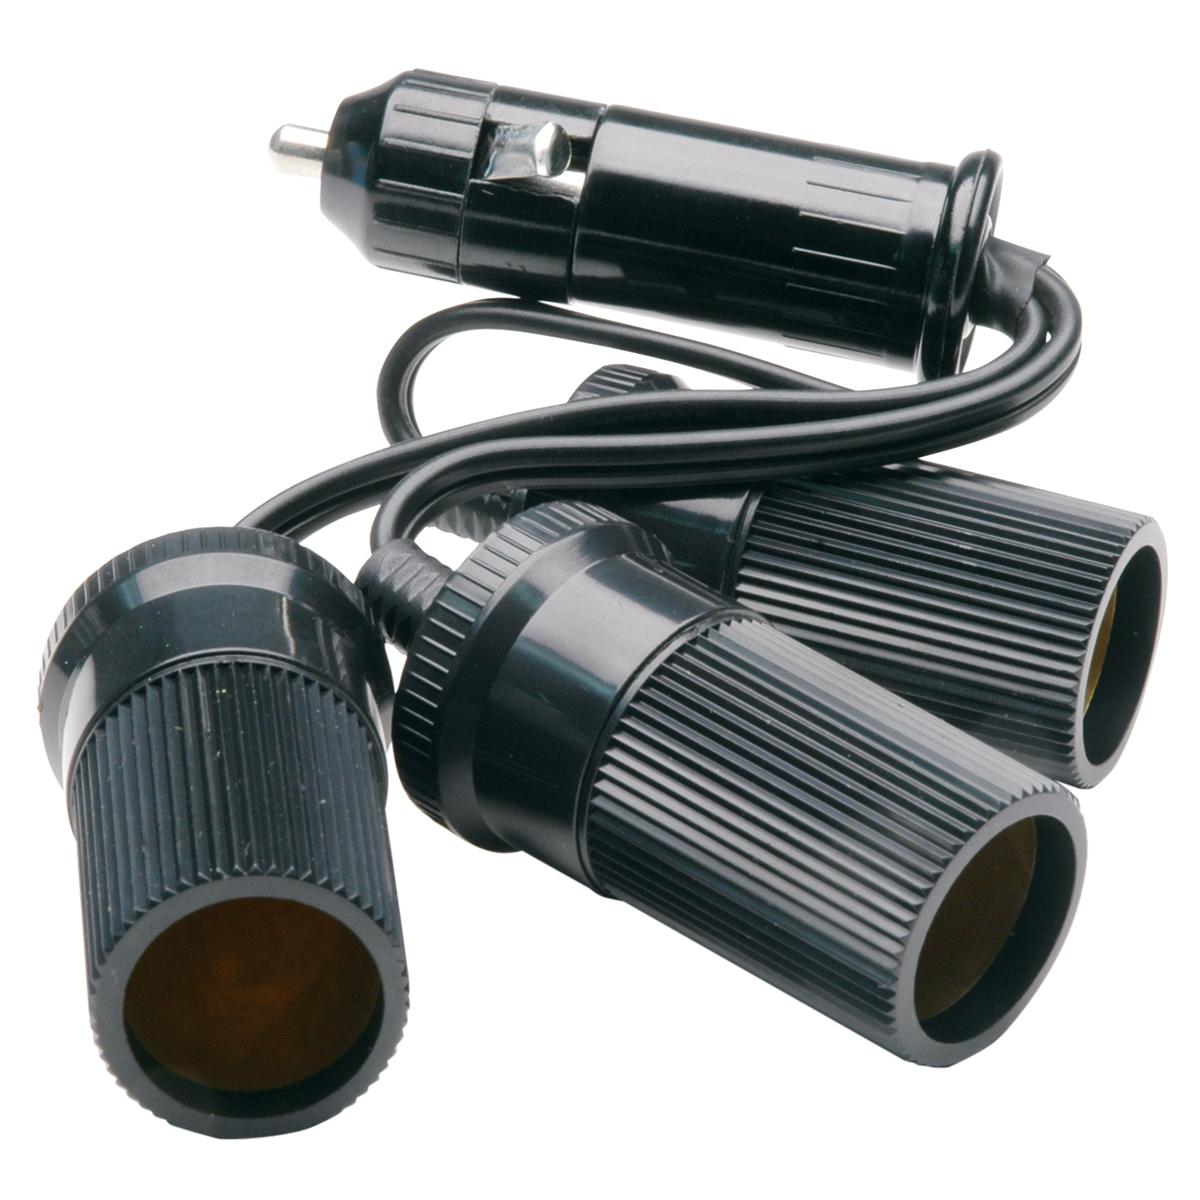 12 volt cigarette lighter wiring diagram delco remy cs130 alternator truckspec 3 outlet adapter with